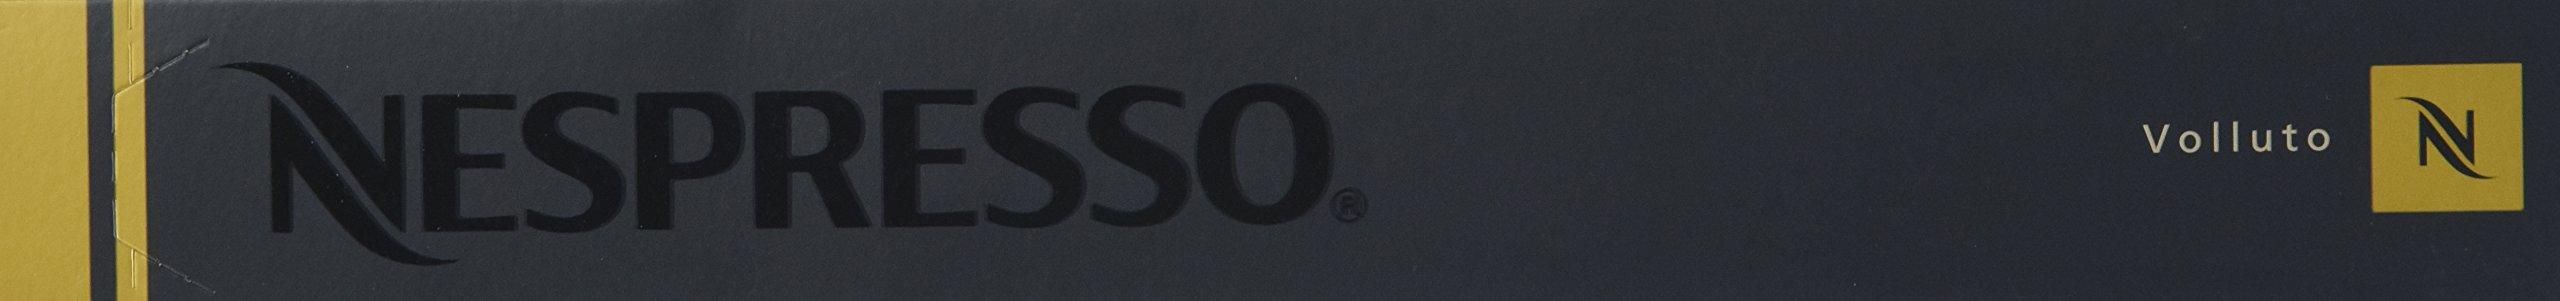 Nespresso OriginalLine: Volluto, 50 Count - ''NOT compatible with Vertuoline''